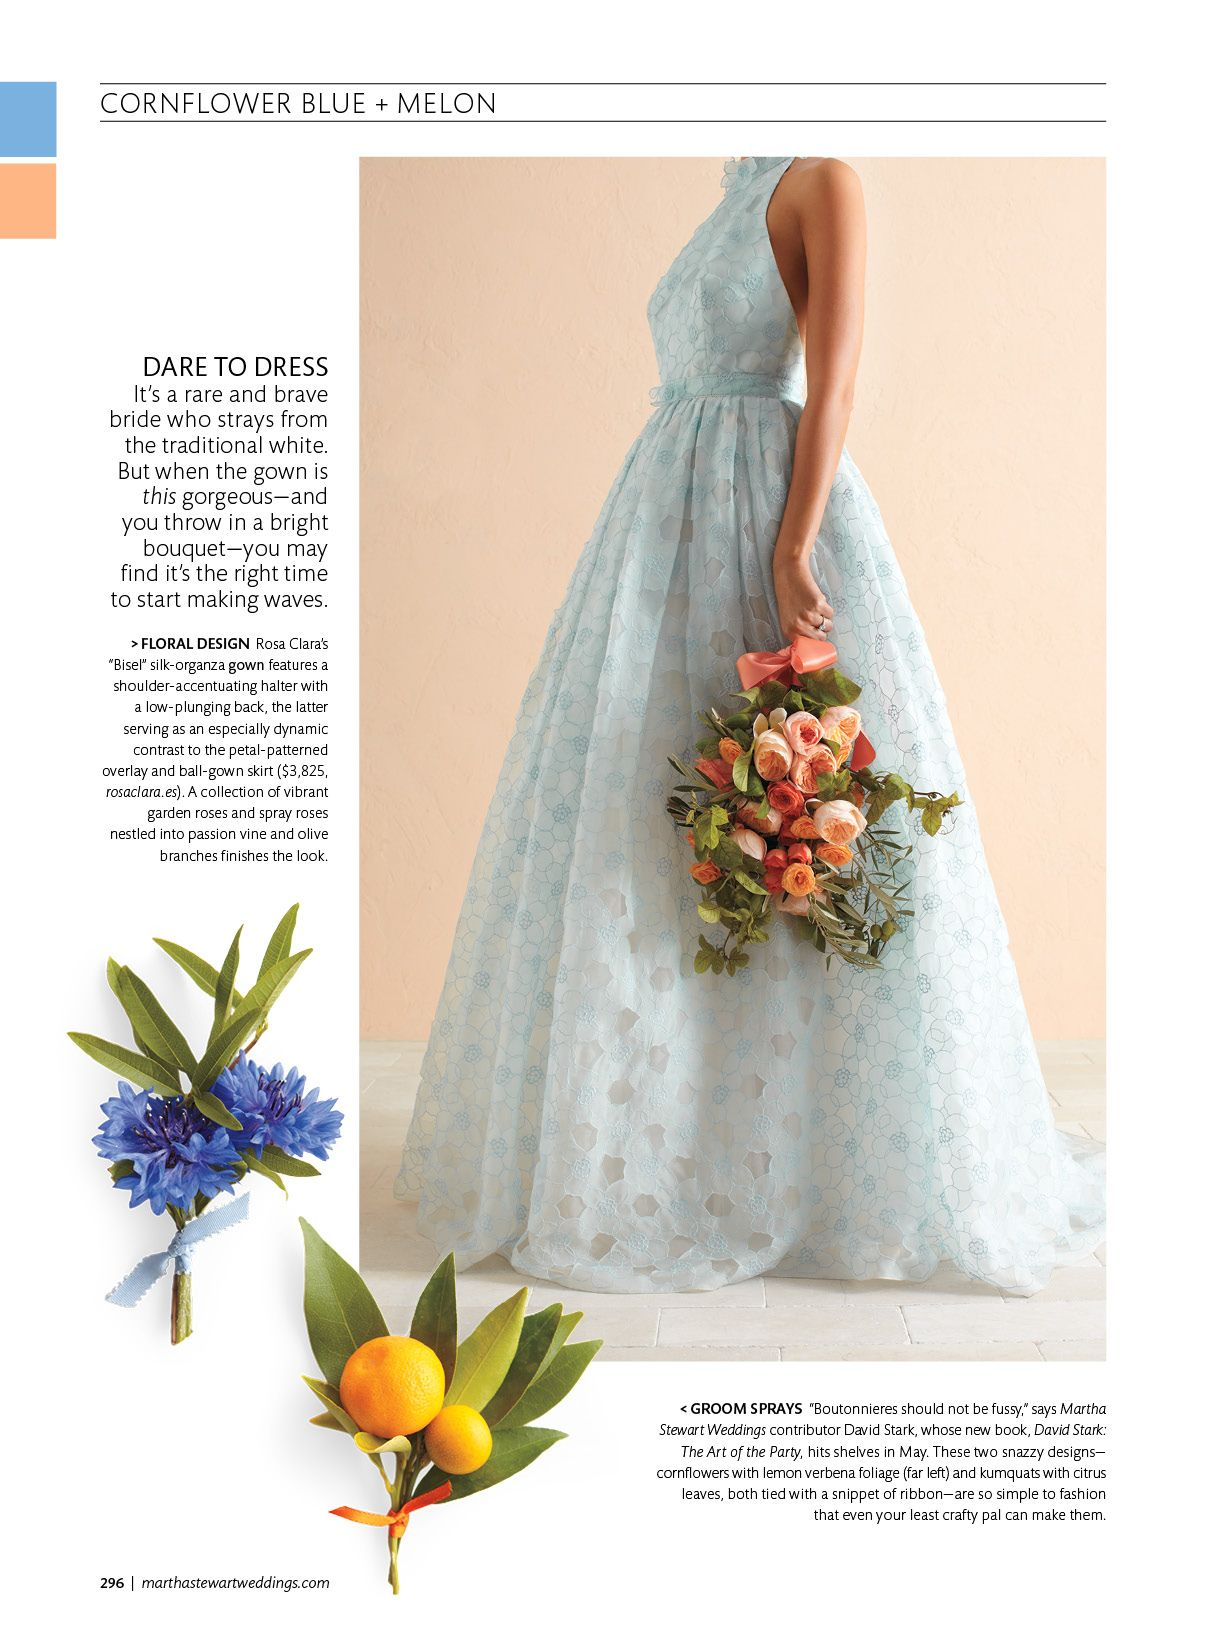 Pale blue silk organza wedding dress by Rosa Clara featured in the Spring 2013 issue of @Martha Stewart Weddings Magazine via @Snippet & Ink